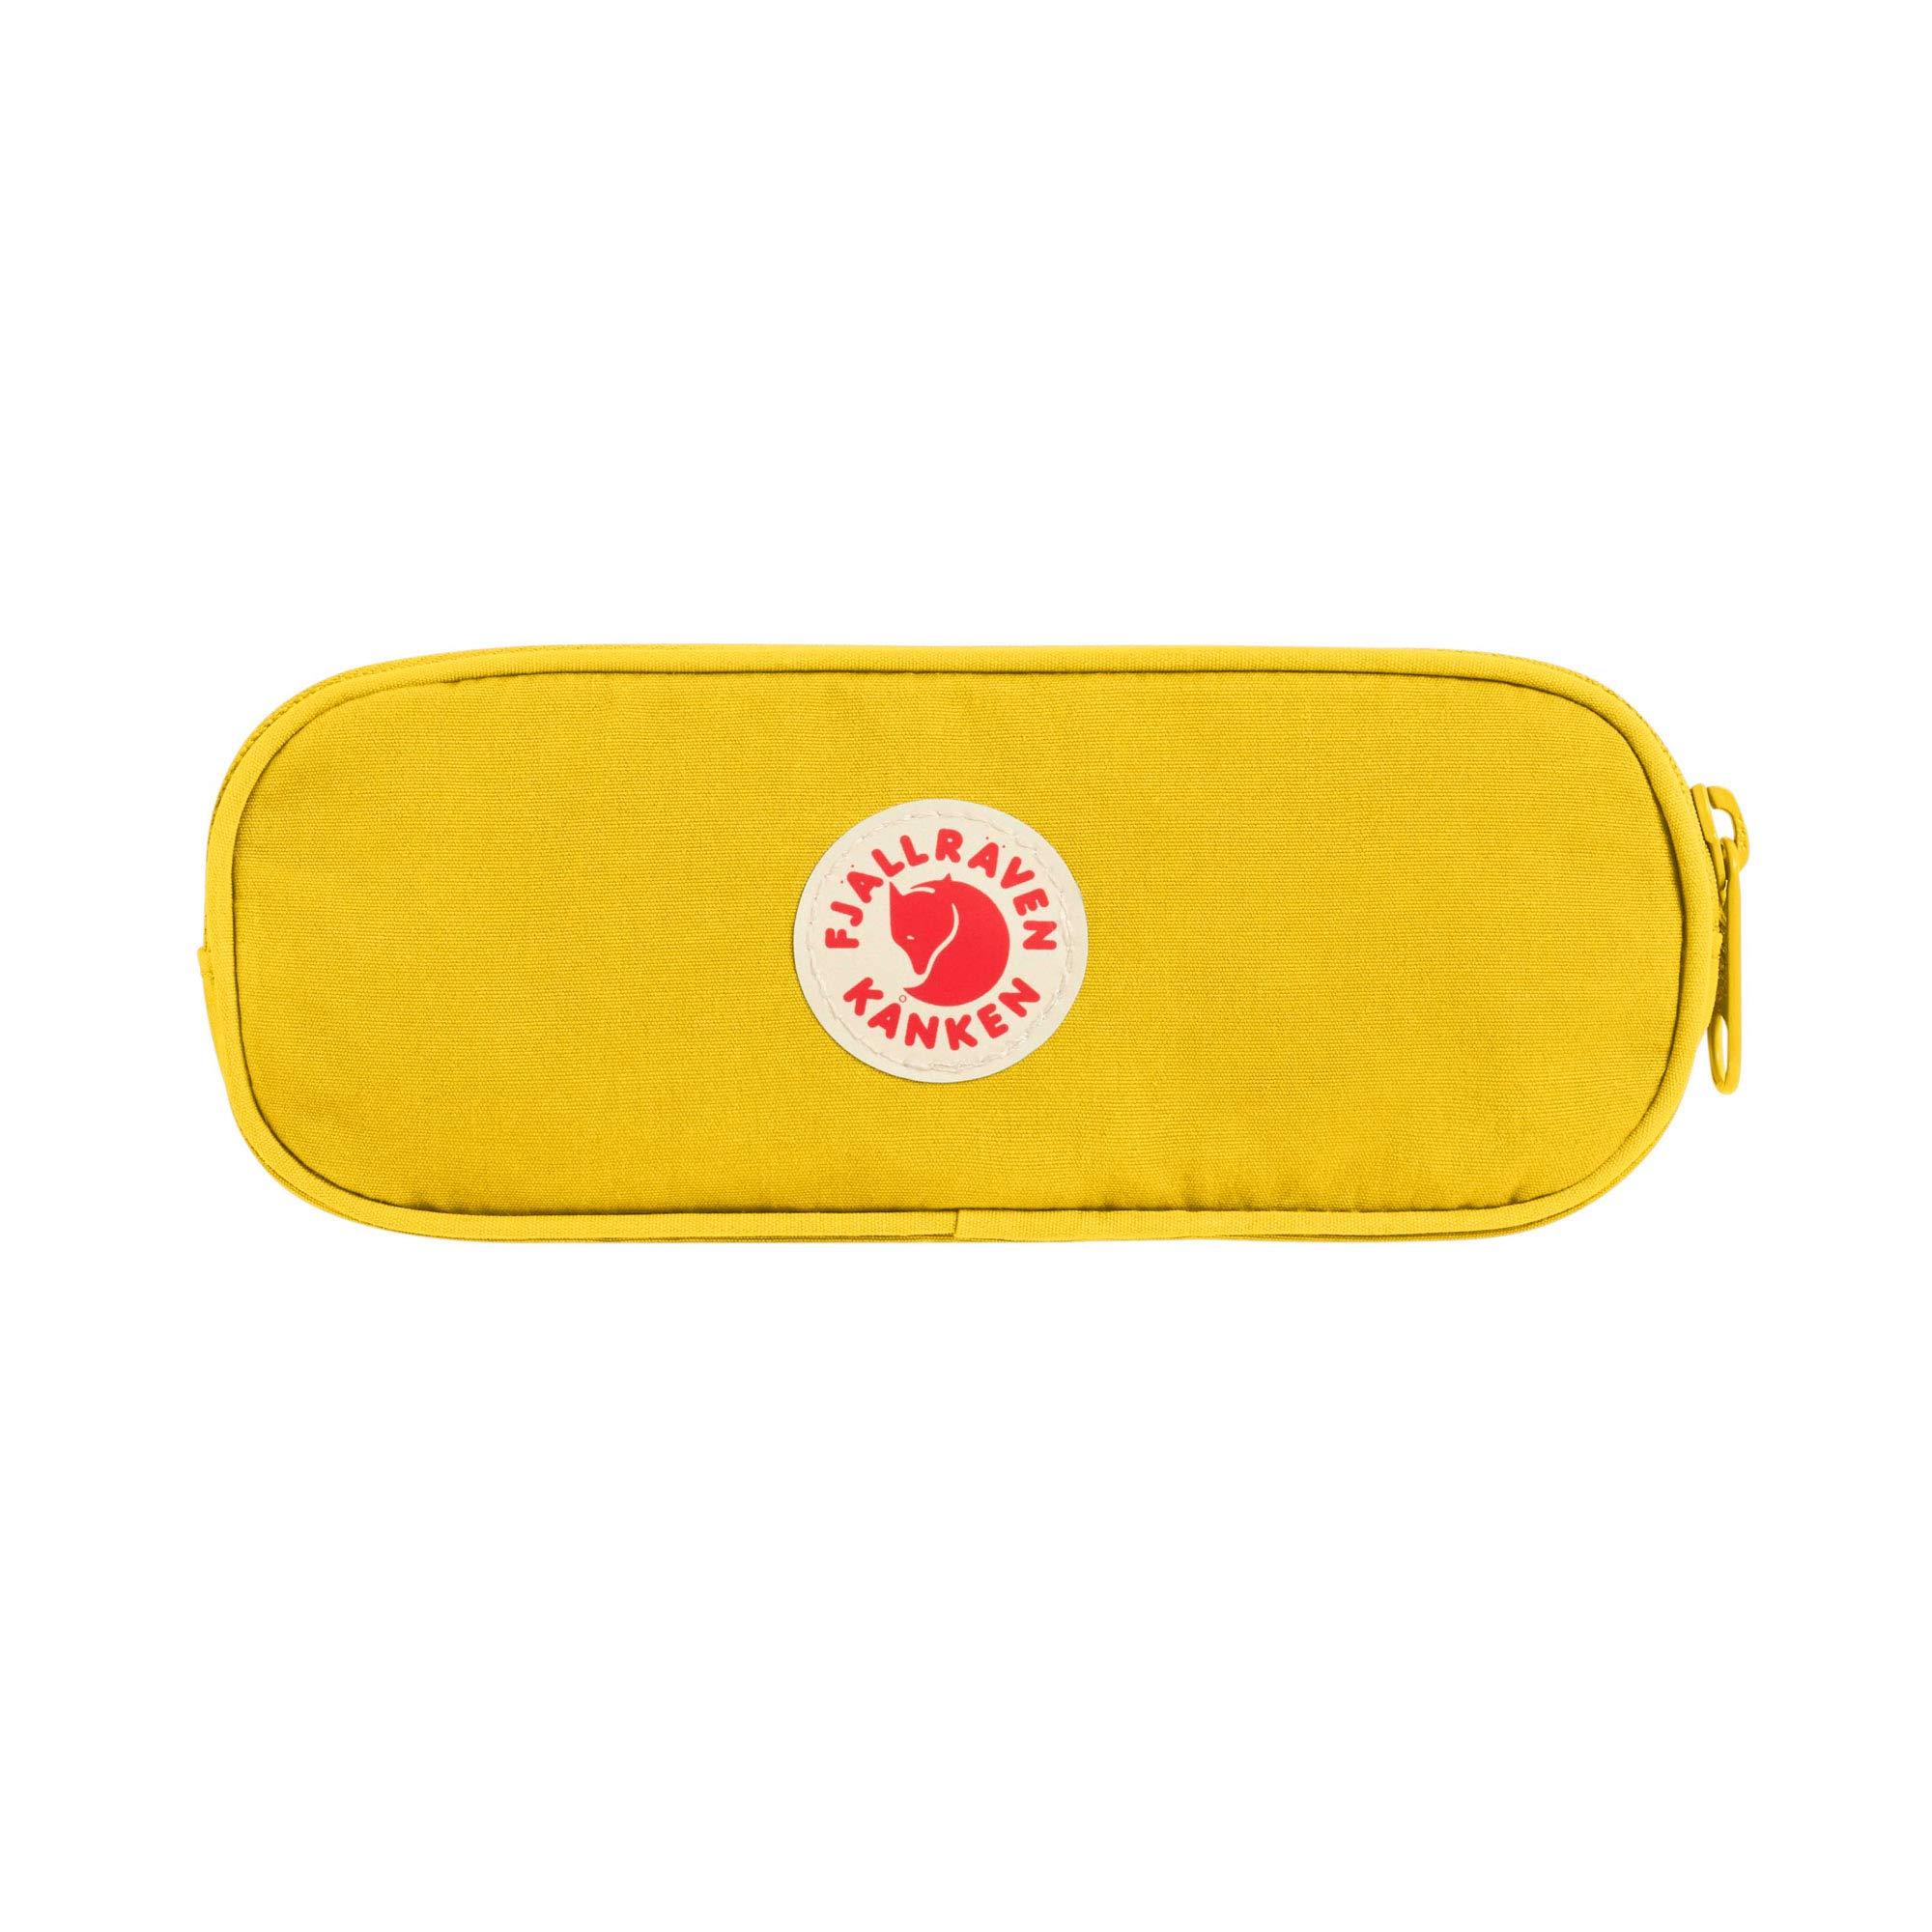 Fjallraven - Kanken Pen and Pencil Case, Warm Yellow by Fjallraven